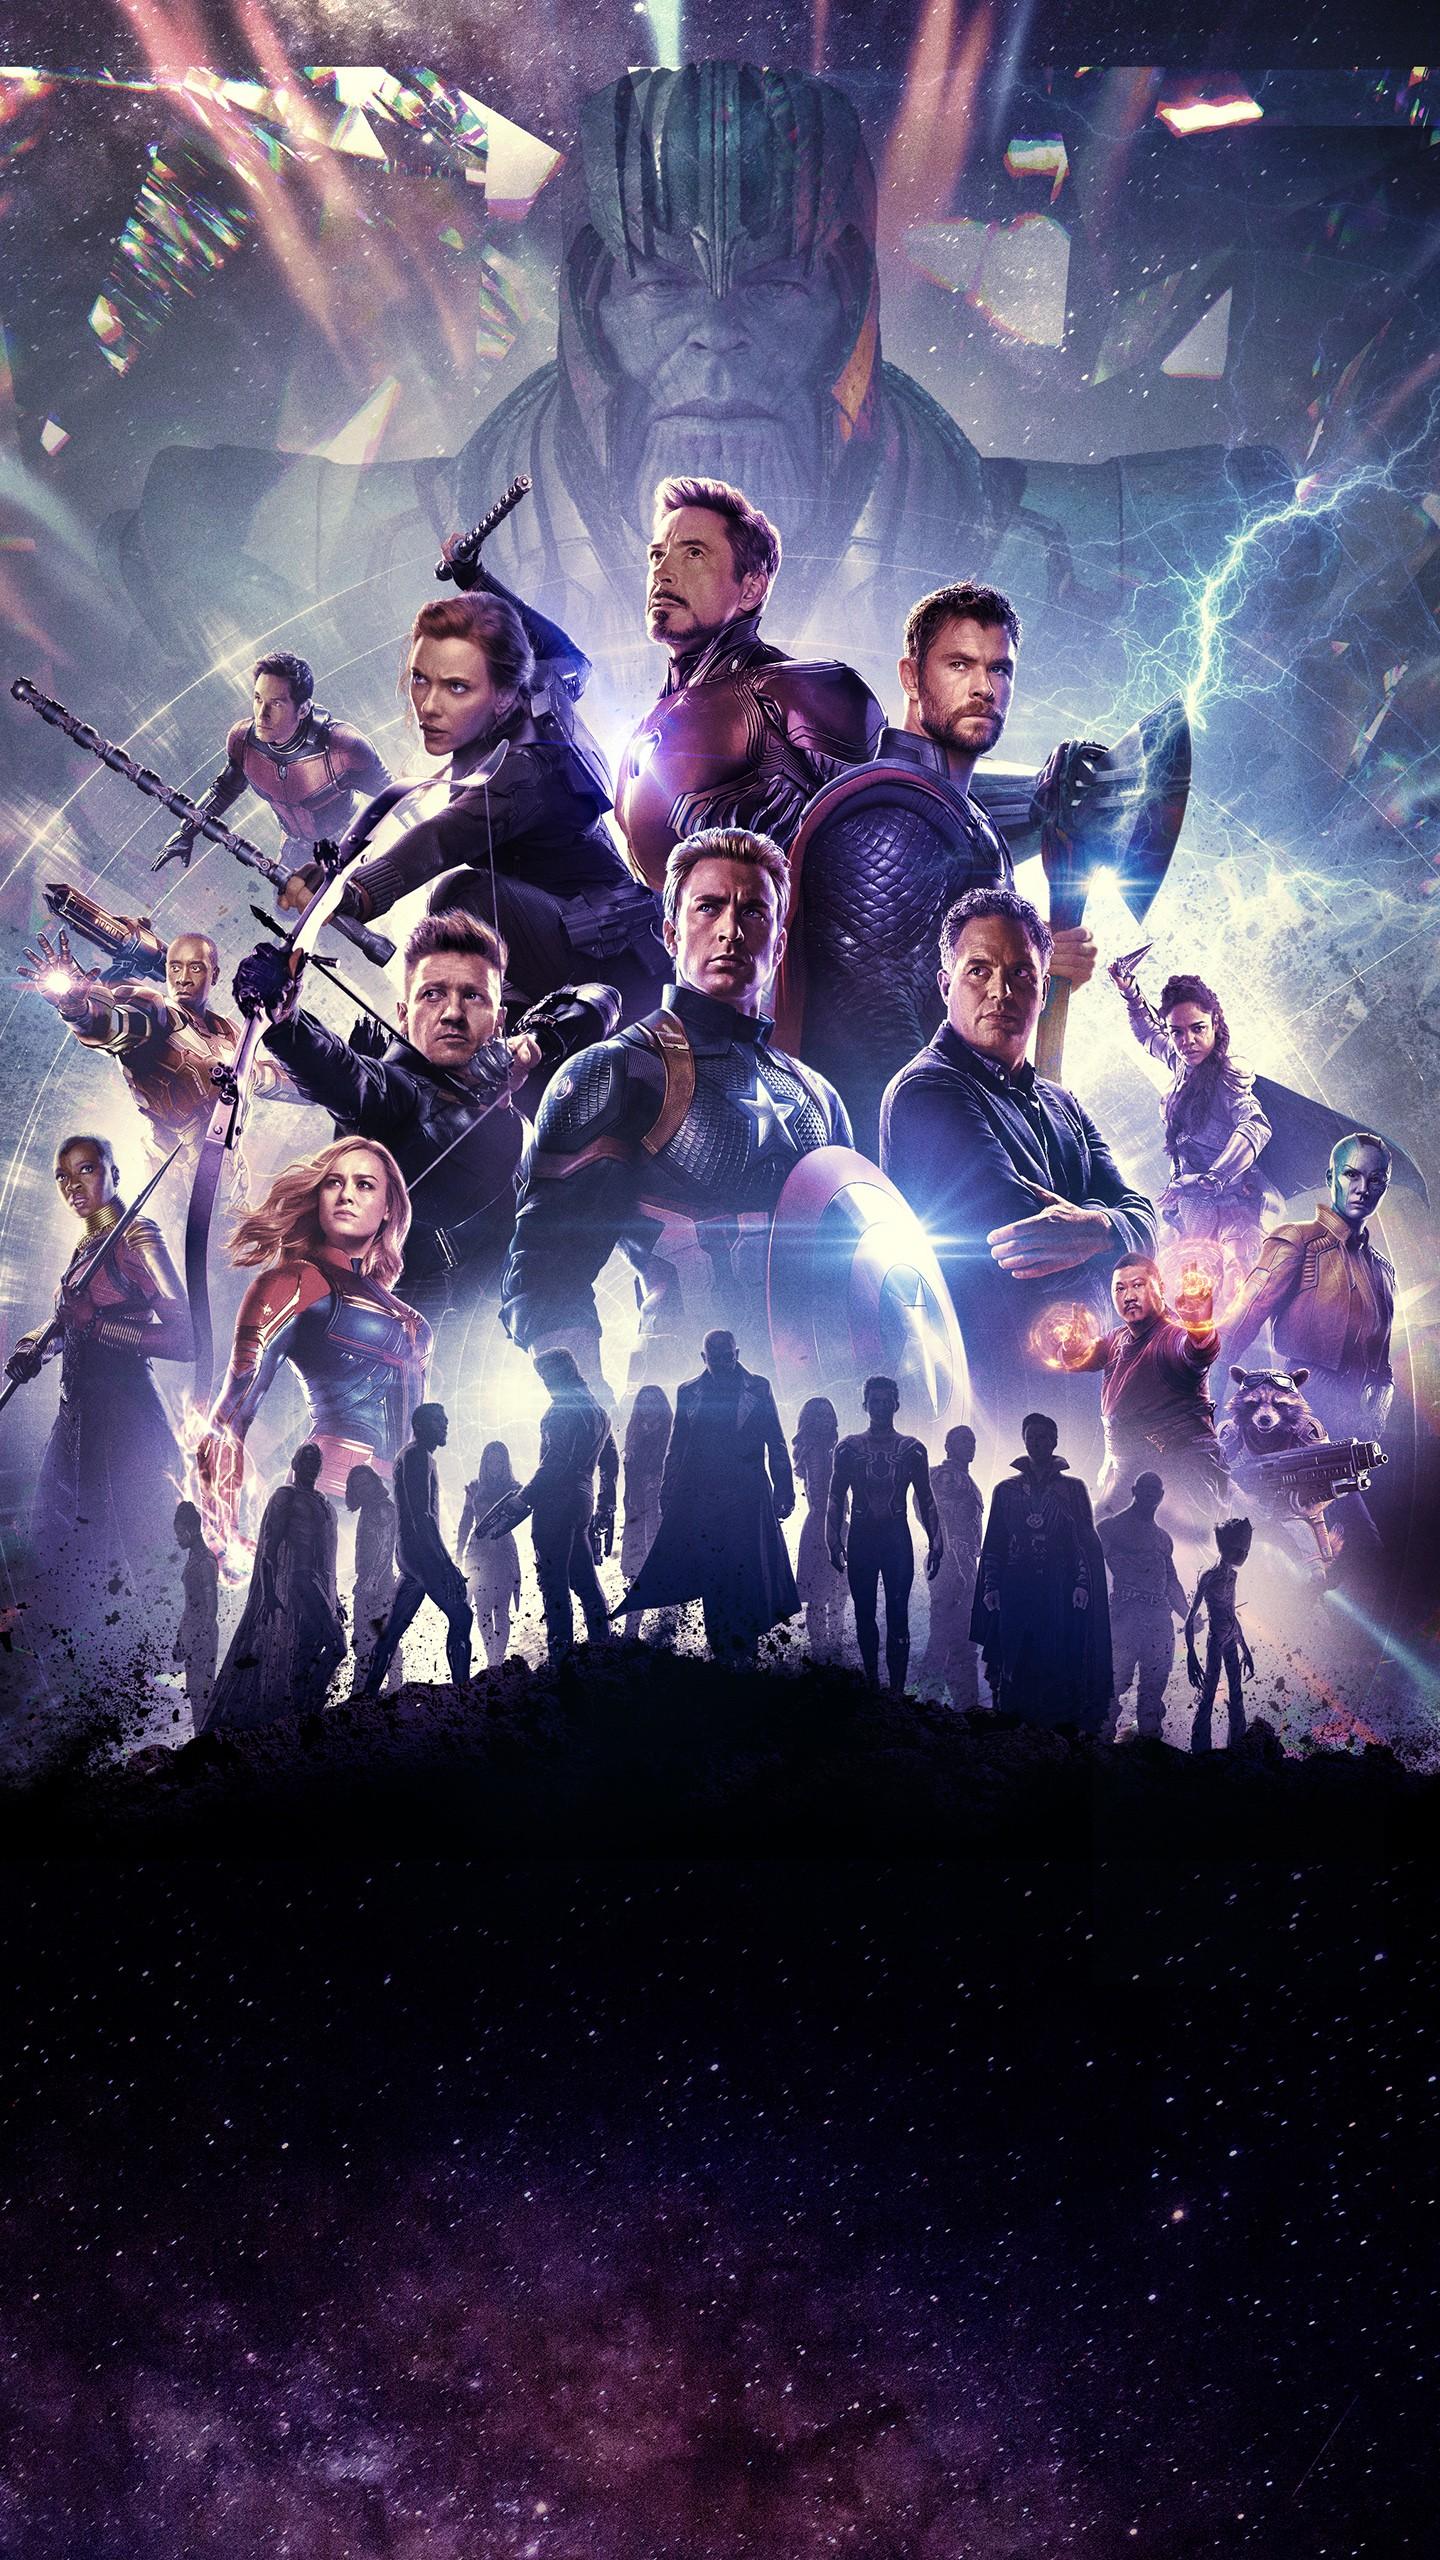 Dragon Ball Wallpaper 3d Hd Avengers Endgame 2019 Wallpapers Hd Wallpapers Id 27991